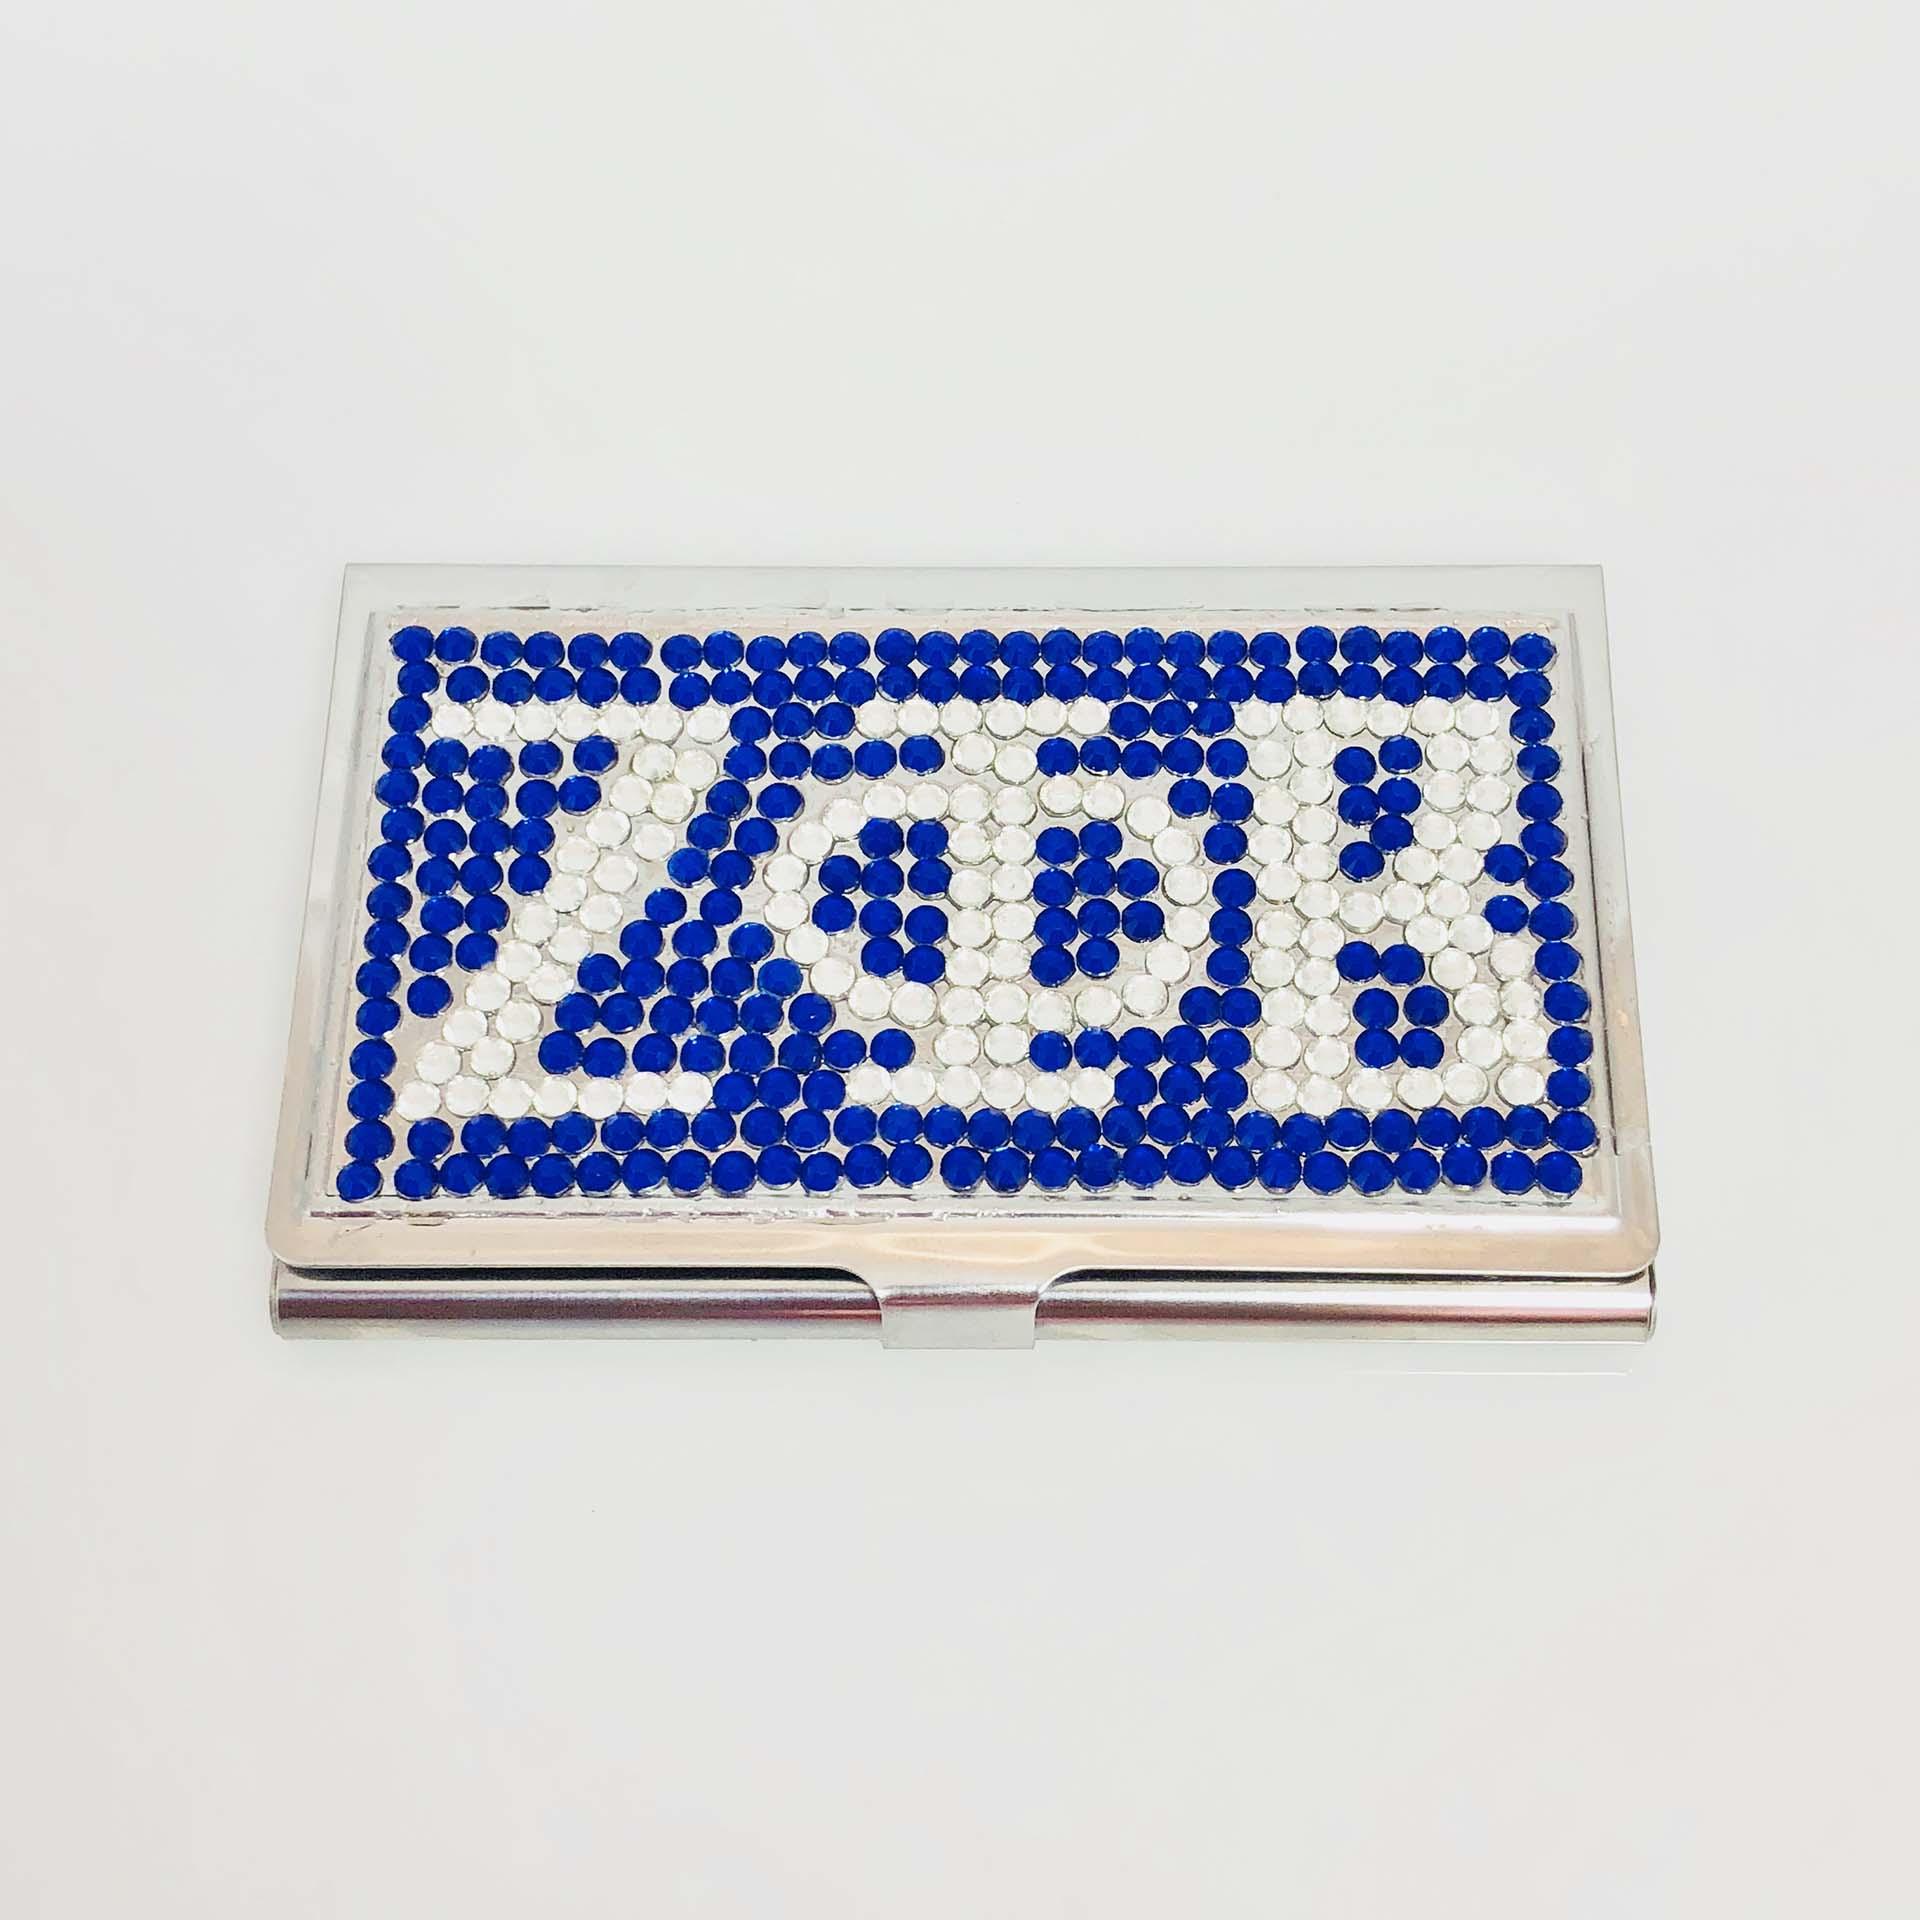 rhinestone business card holder colourmoves